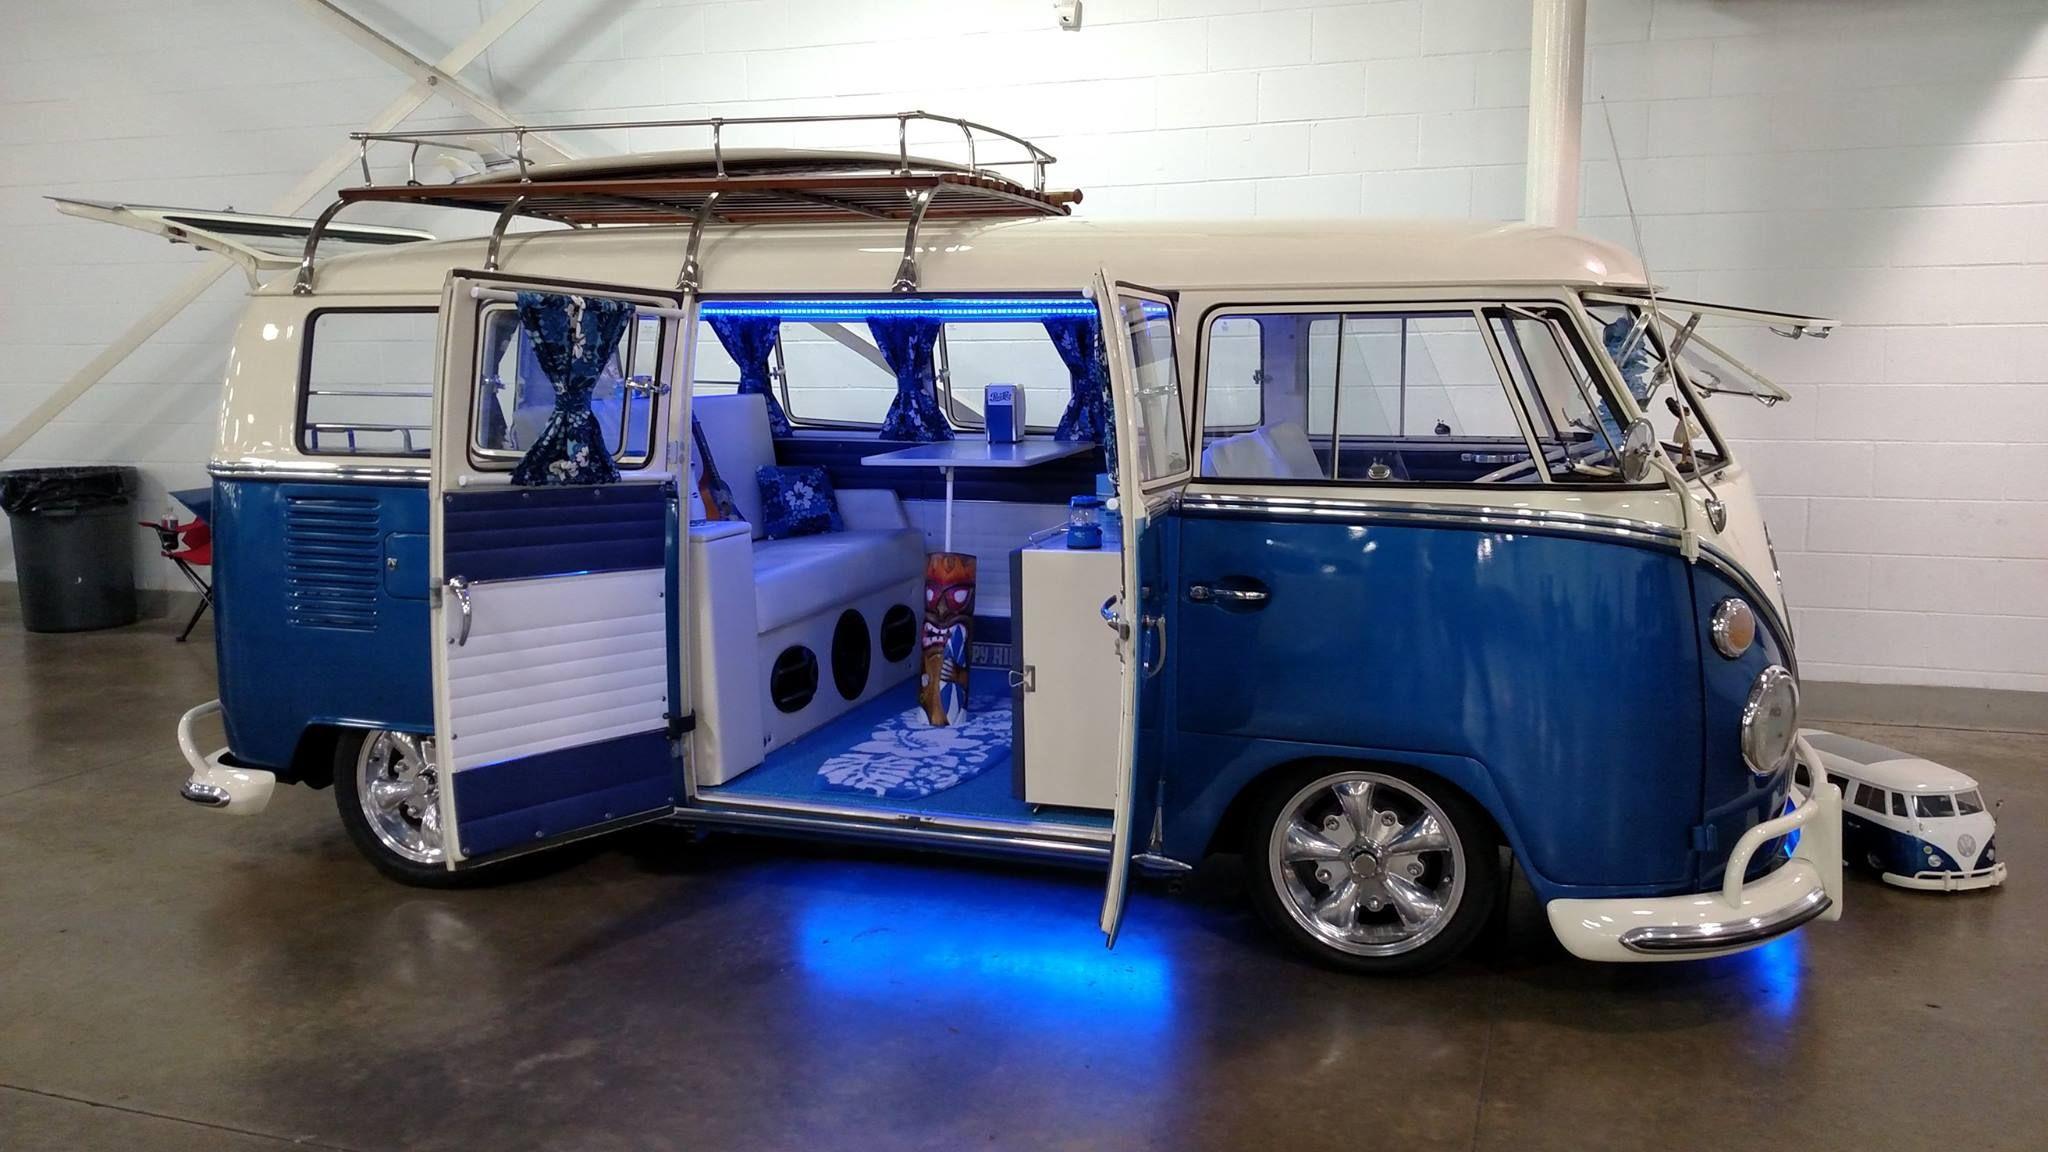 Car interior restoration jacksonville fl - 1966 T1 Vw Bus Vintage Jacksonville Fl Usa Vw Bus Model